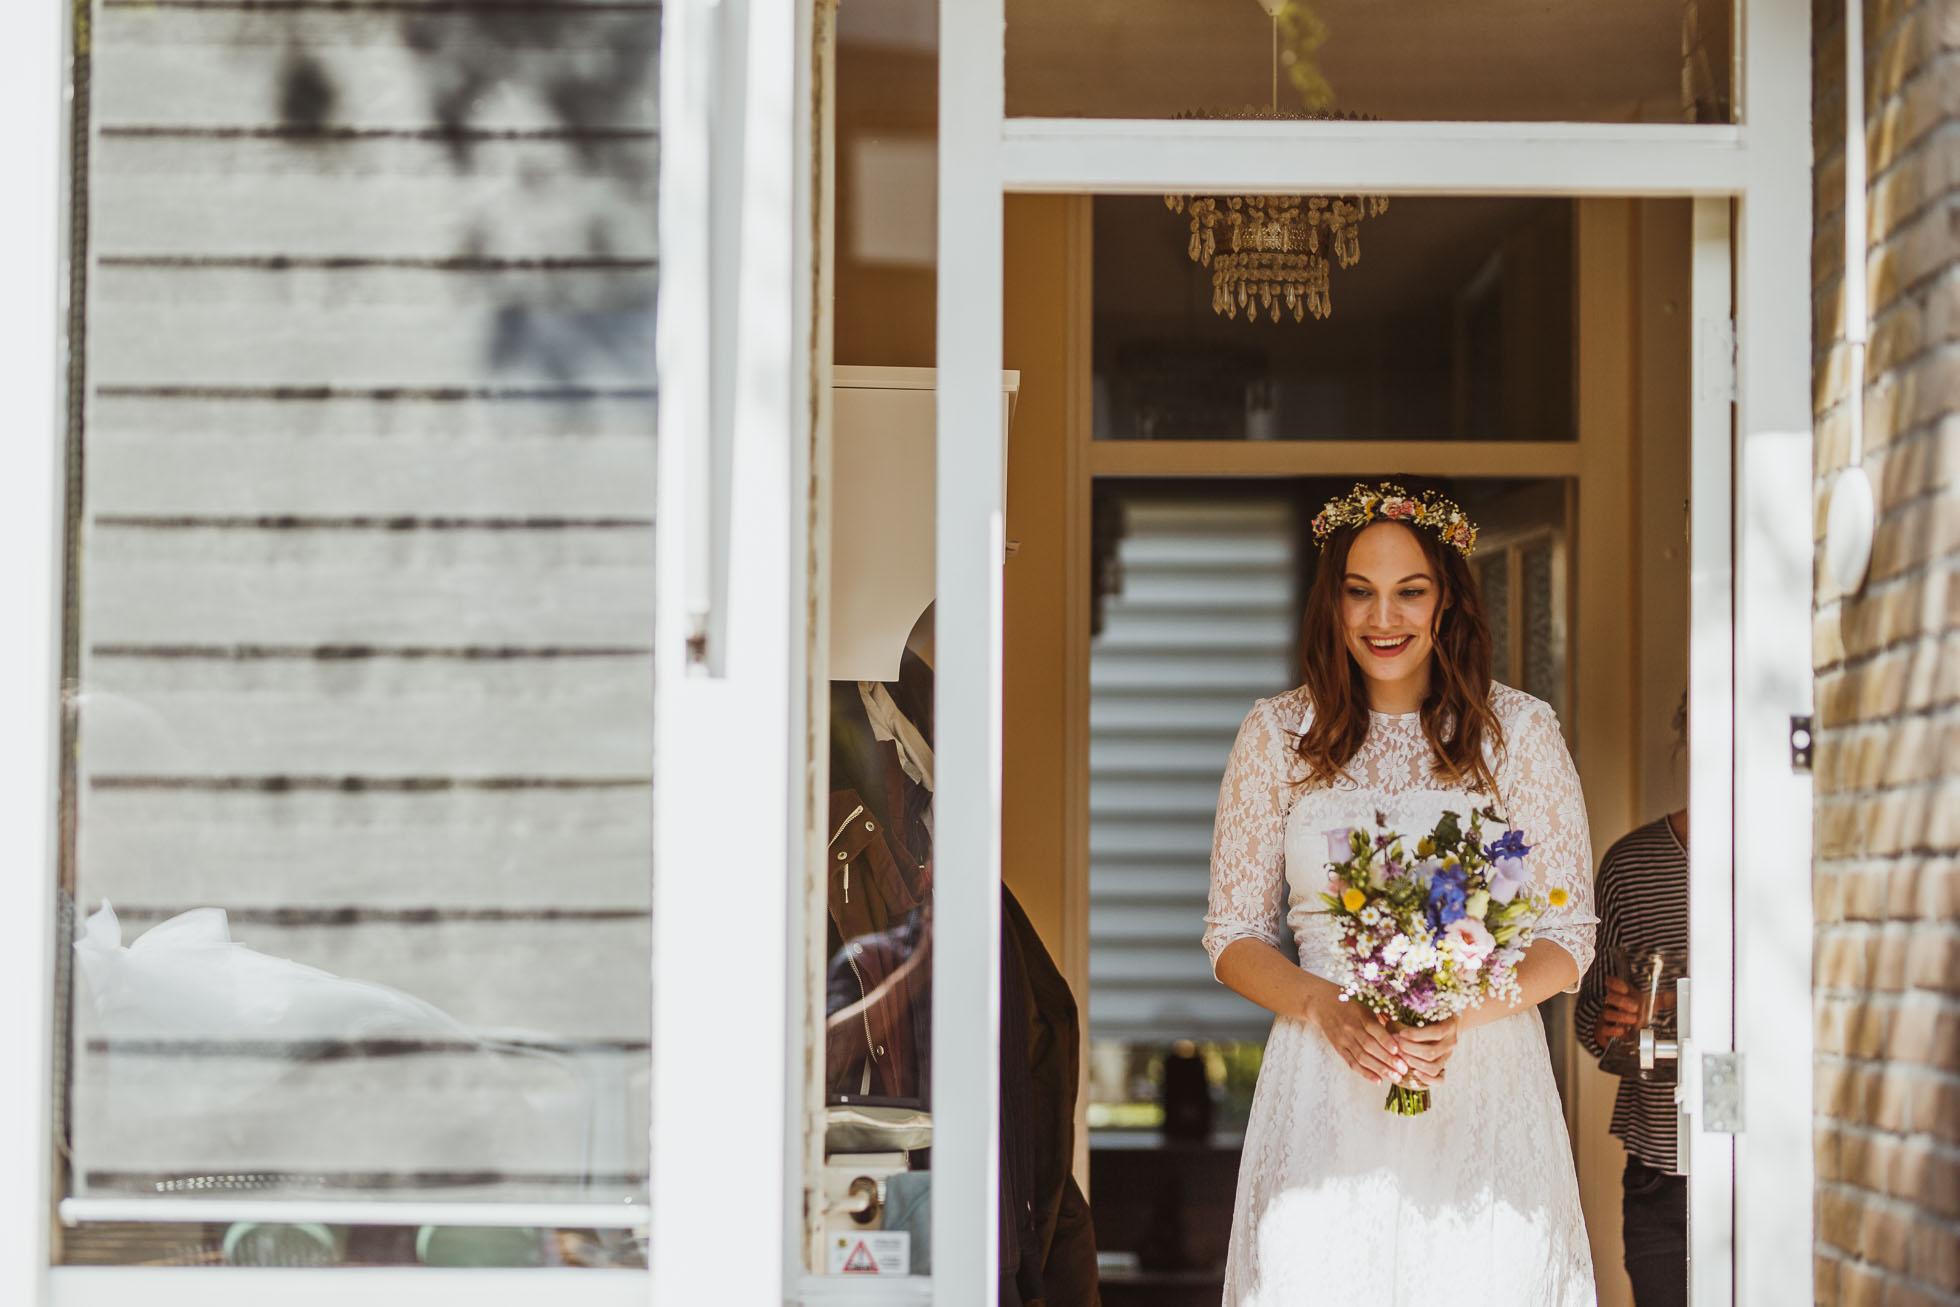 utrecht-wedding-photographer-26.jpg